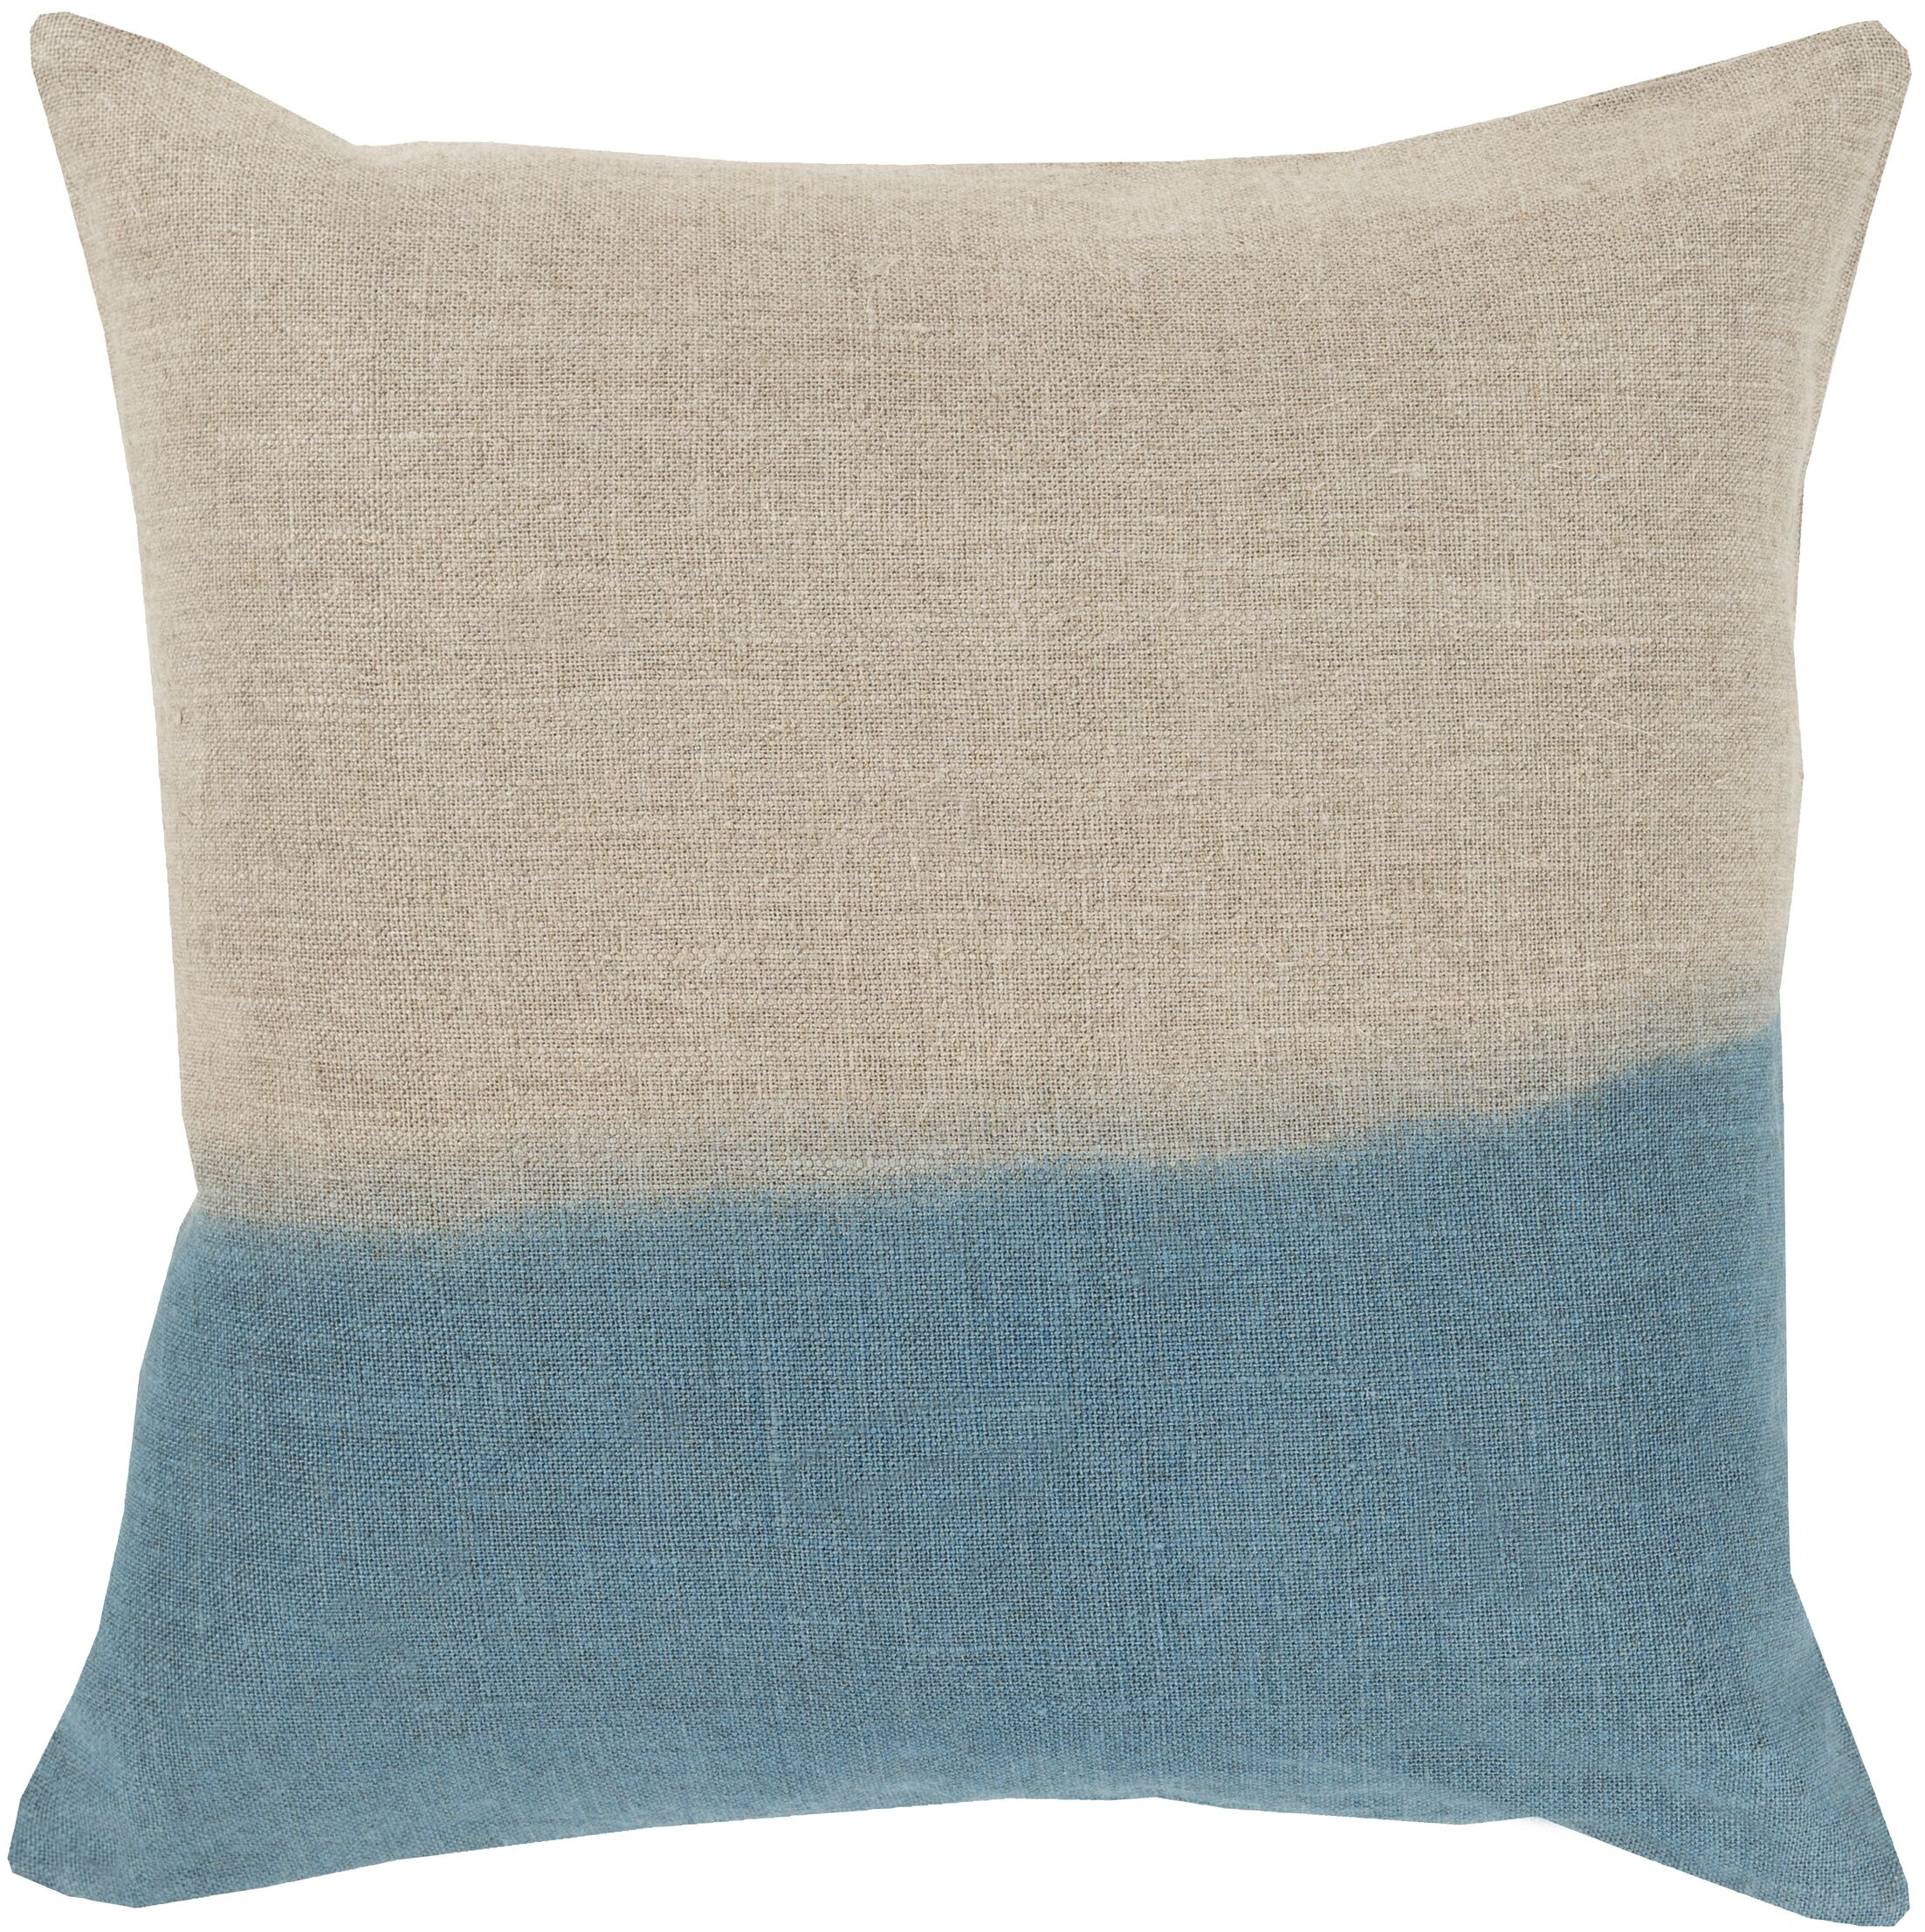 Byromville Linen Throw Pillow Color: Teal, Size: 20